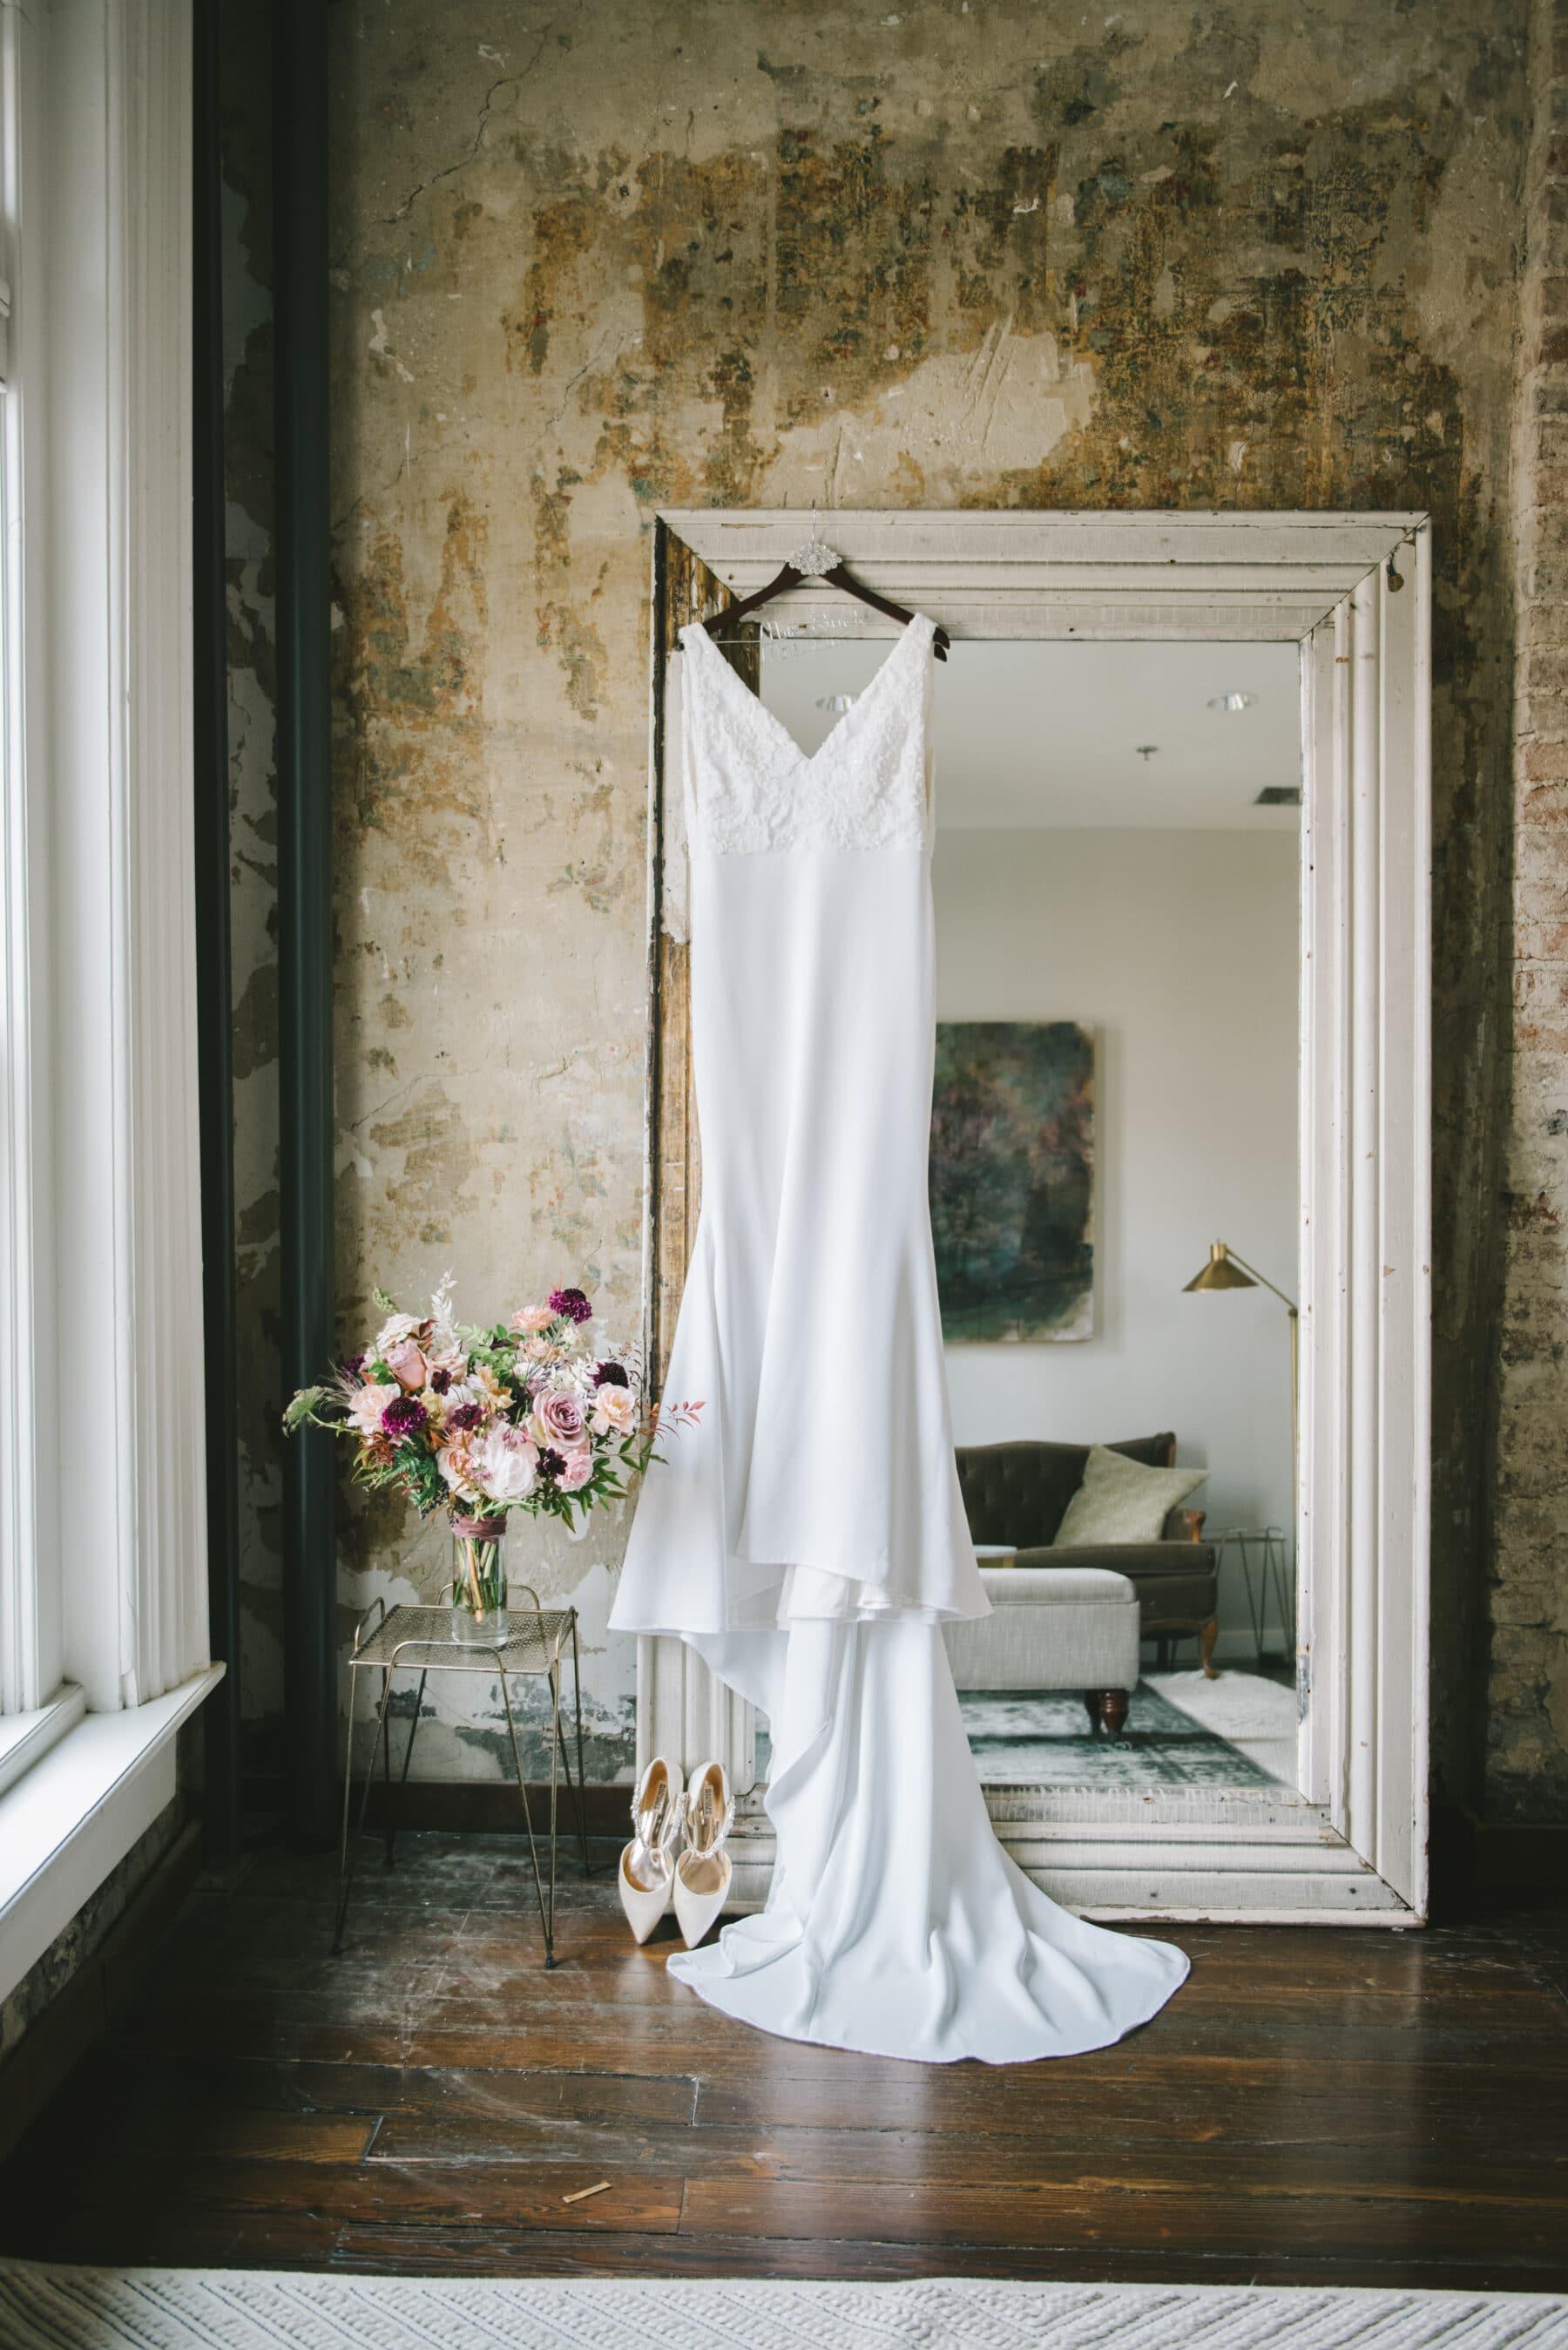 Alyssa Kristin Wedding Dress from The Loveliest Bridal Boutique | Nashville Bride Guide